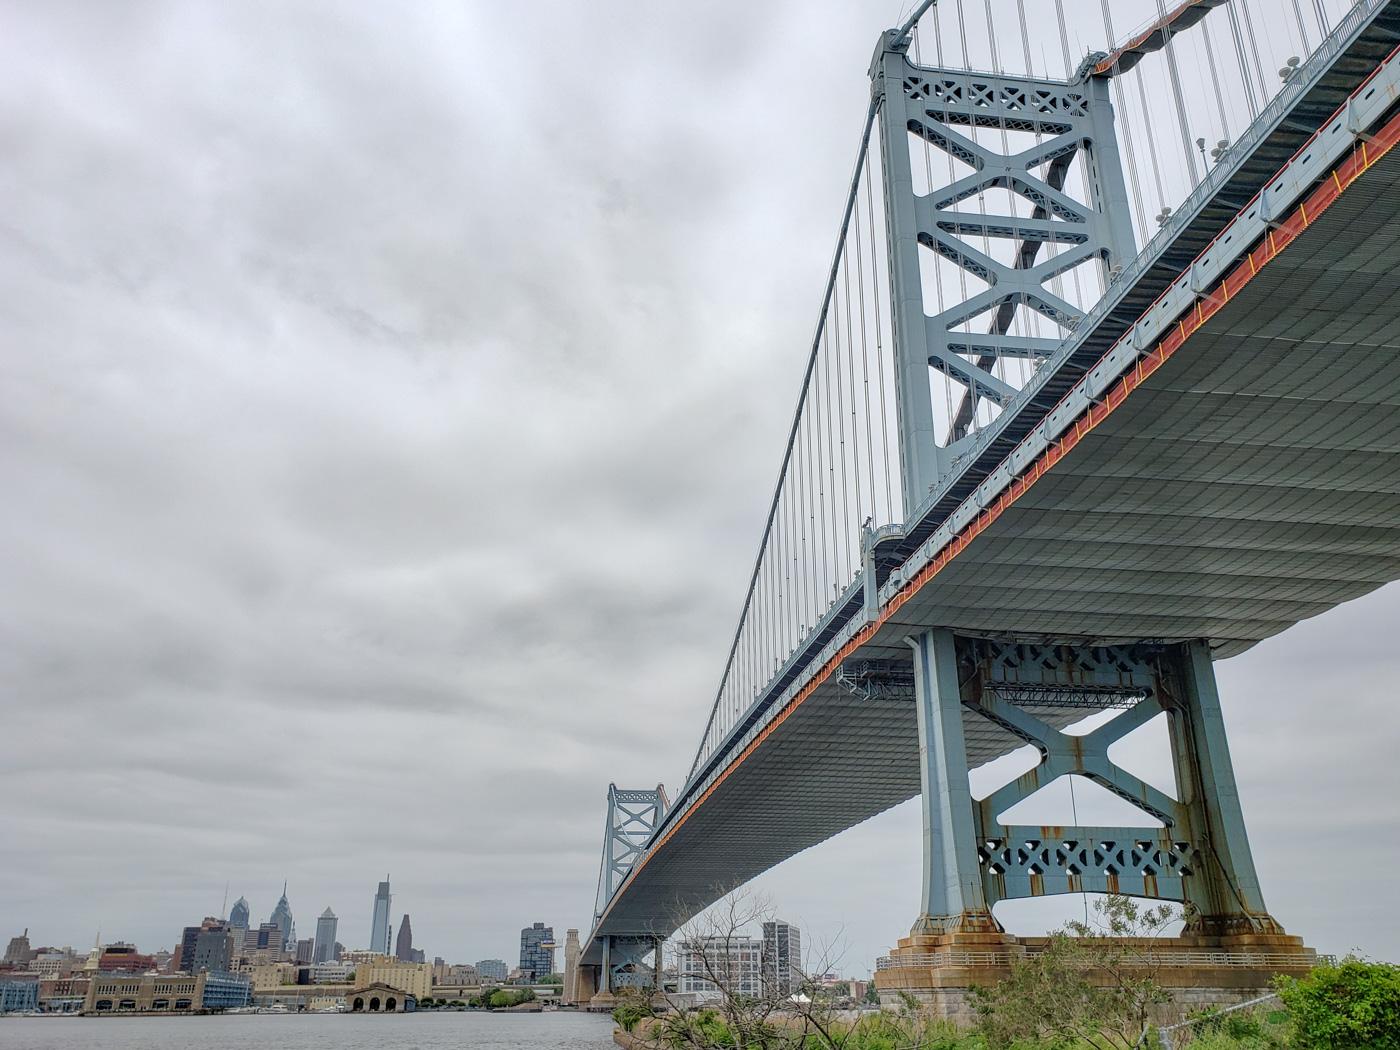 Benjamin Franklin Bridge from the Jersey Side